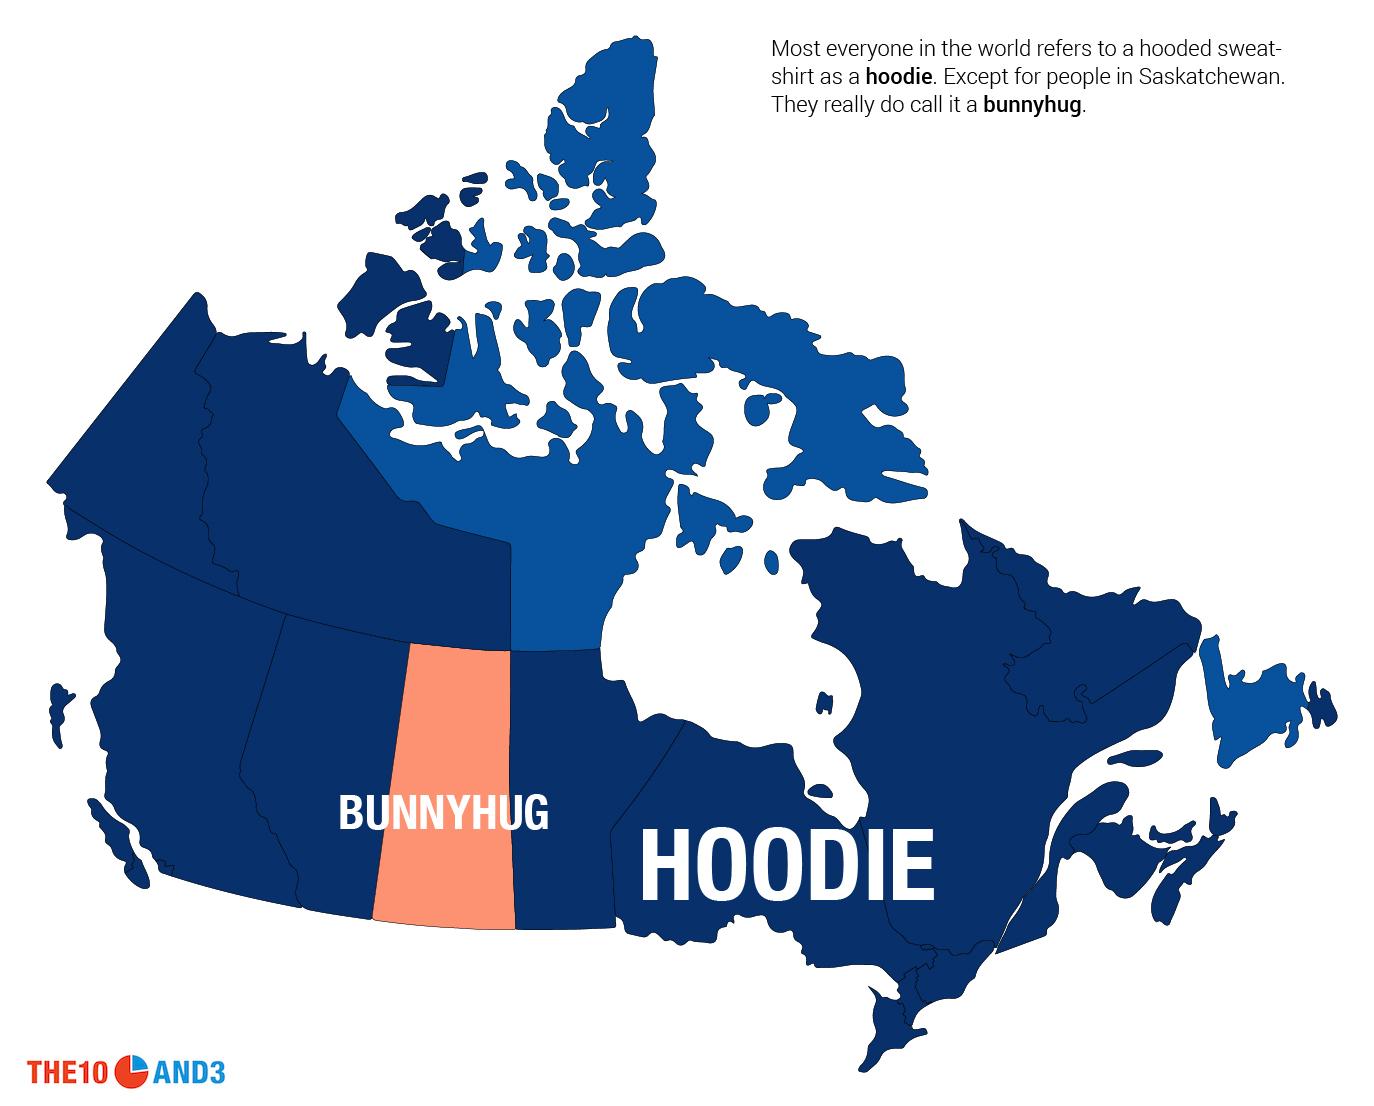 Hoodie vs. Bunnyhug